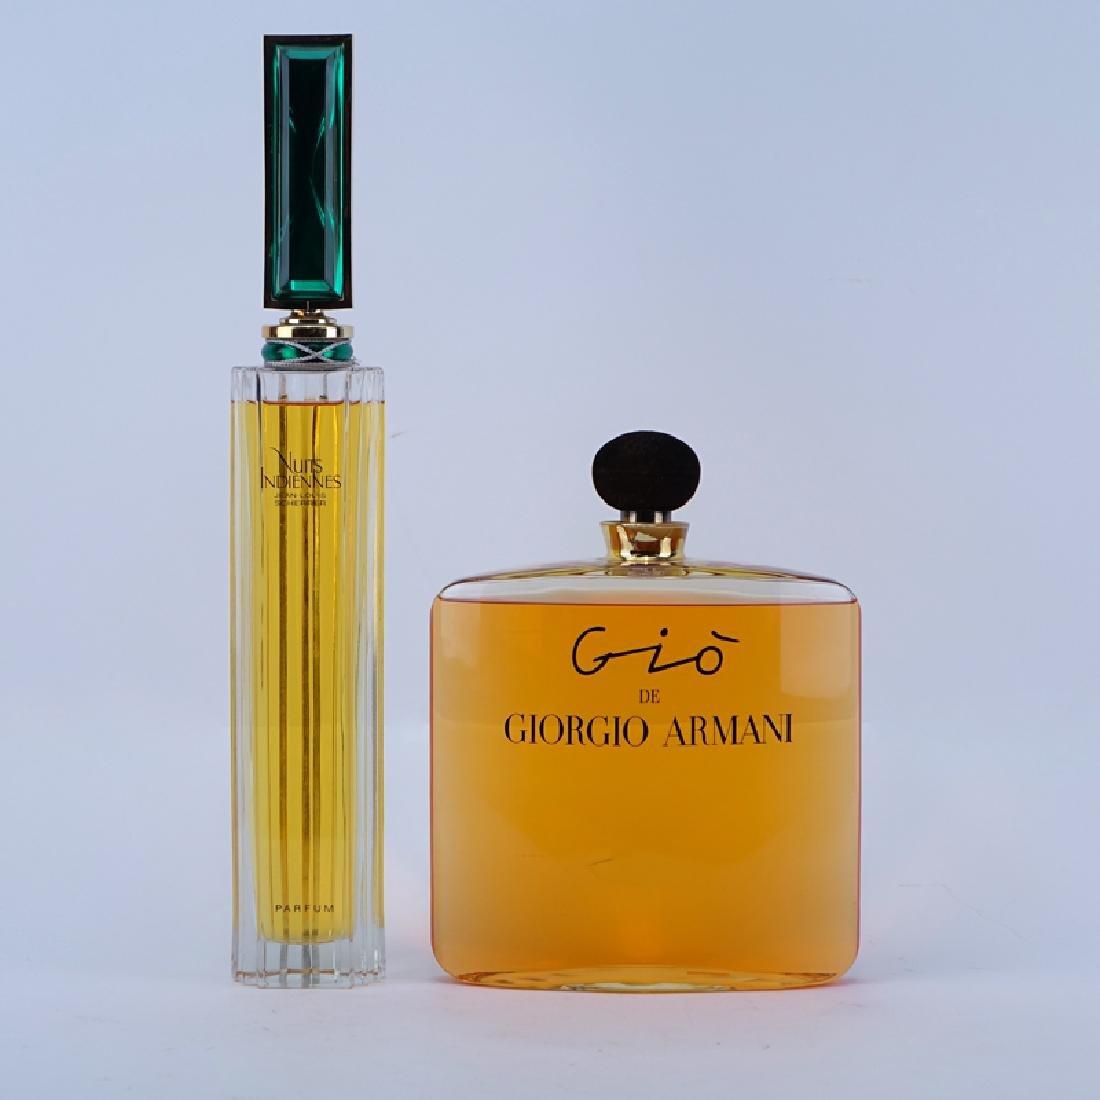 Two (2) Perfume Factices. Includes Gio de Giorgio